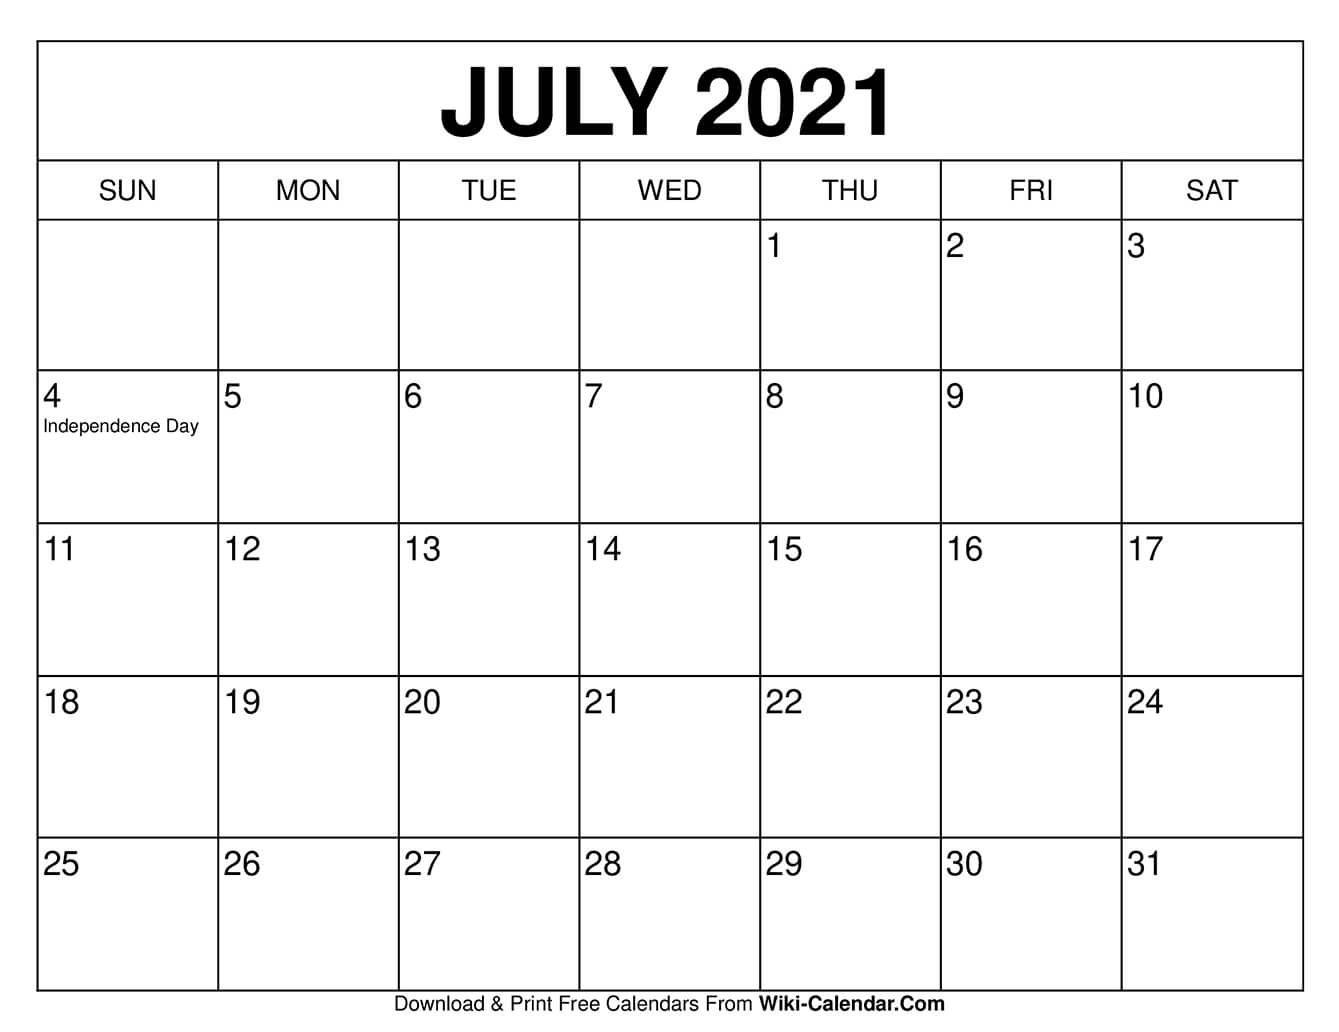 Free Calendars To Print, Free Calendar